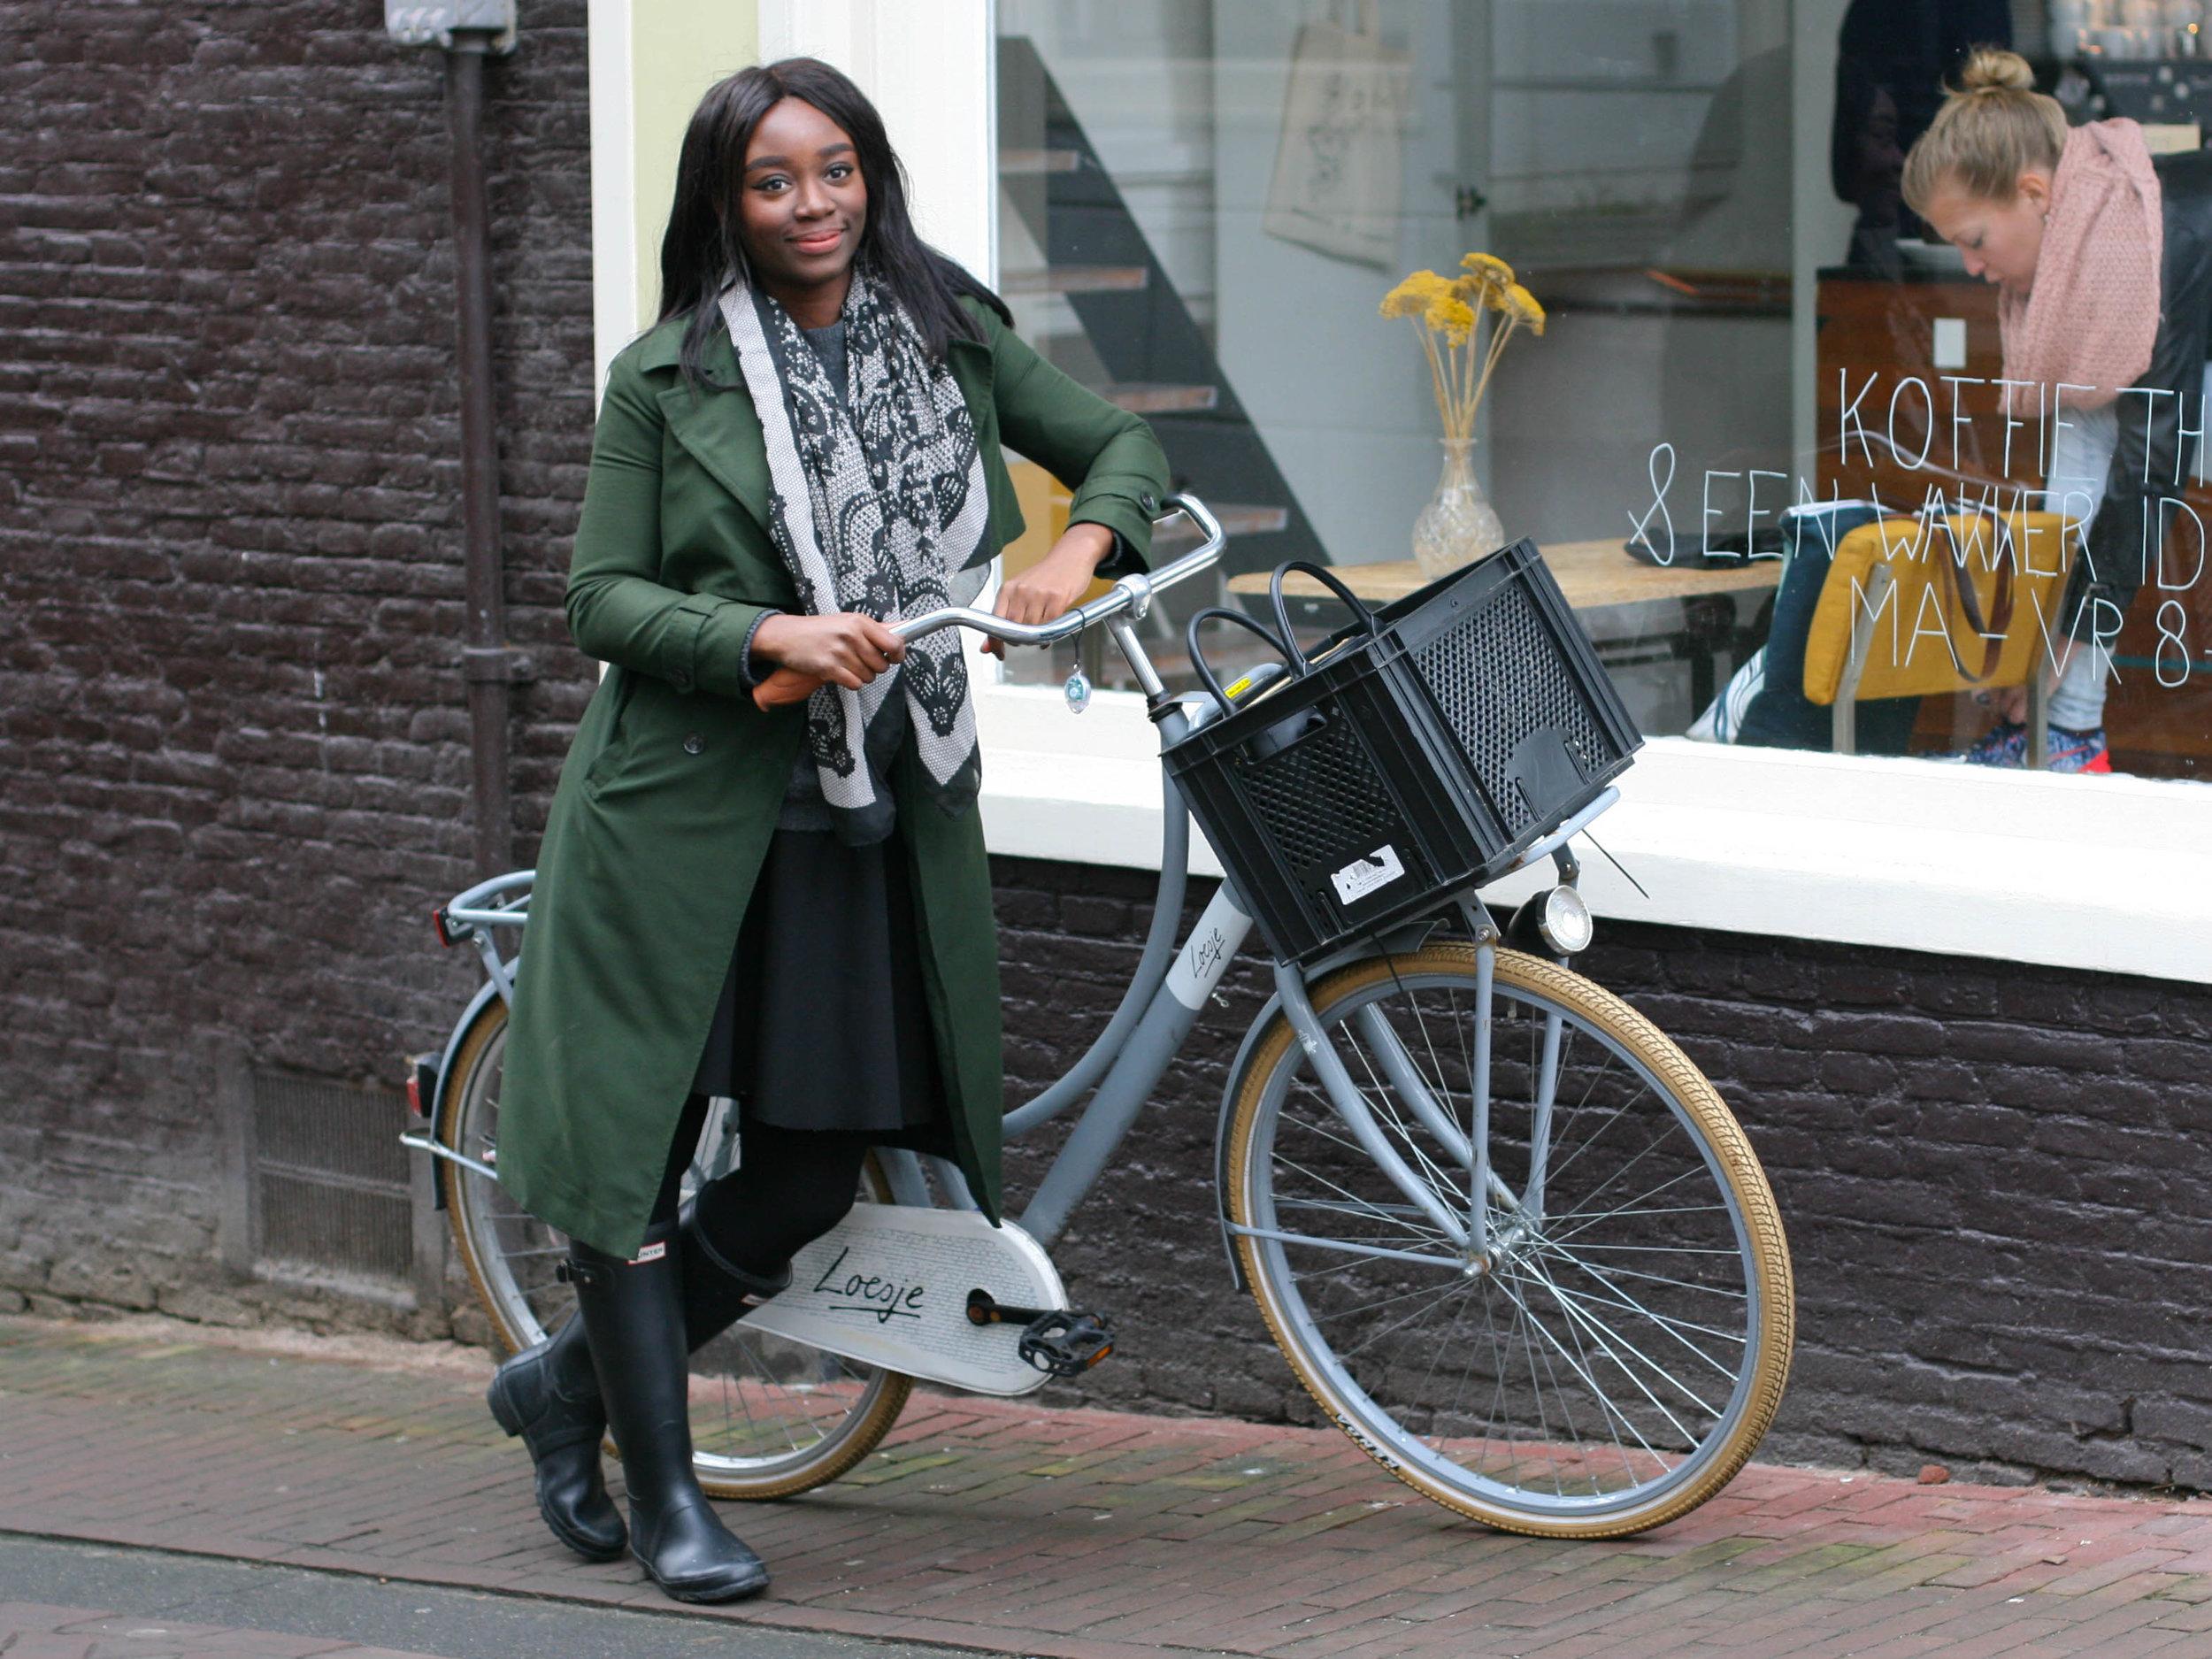 Amsterdam-Cycle-Chic-March-6.jpg